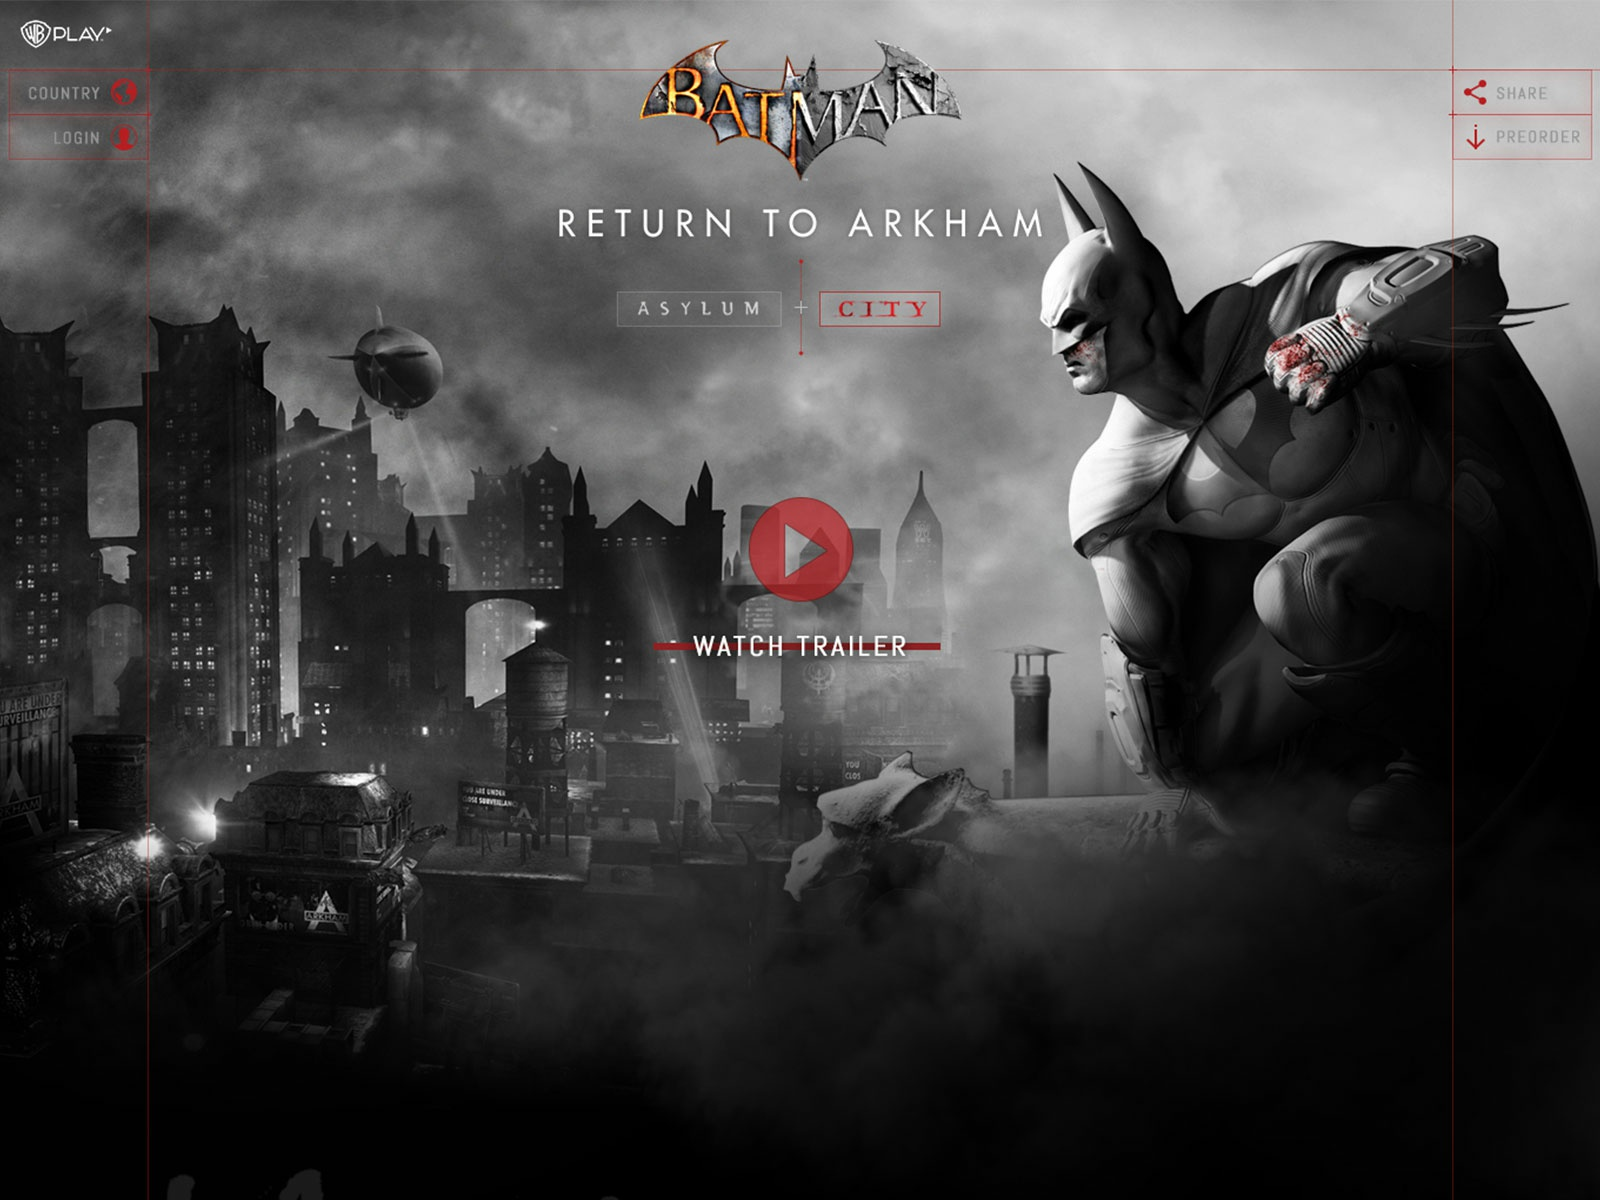 Batman website